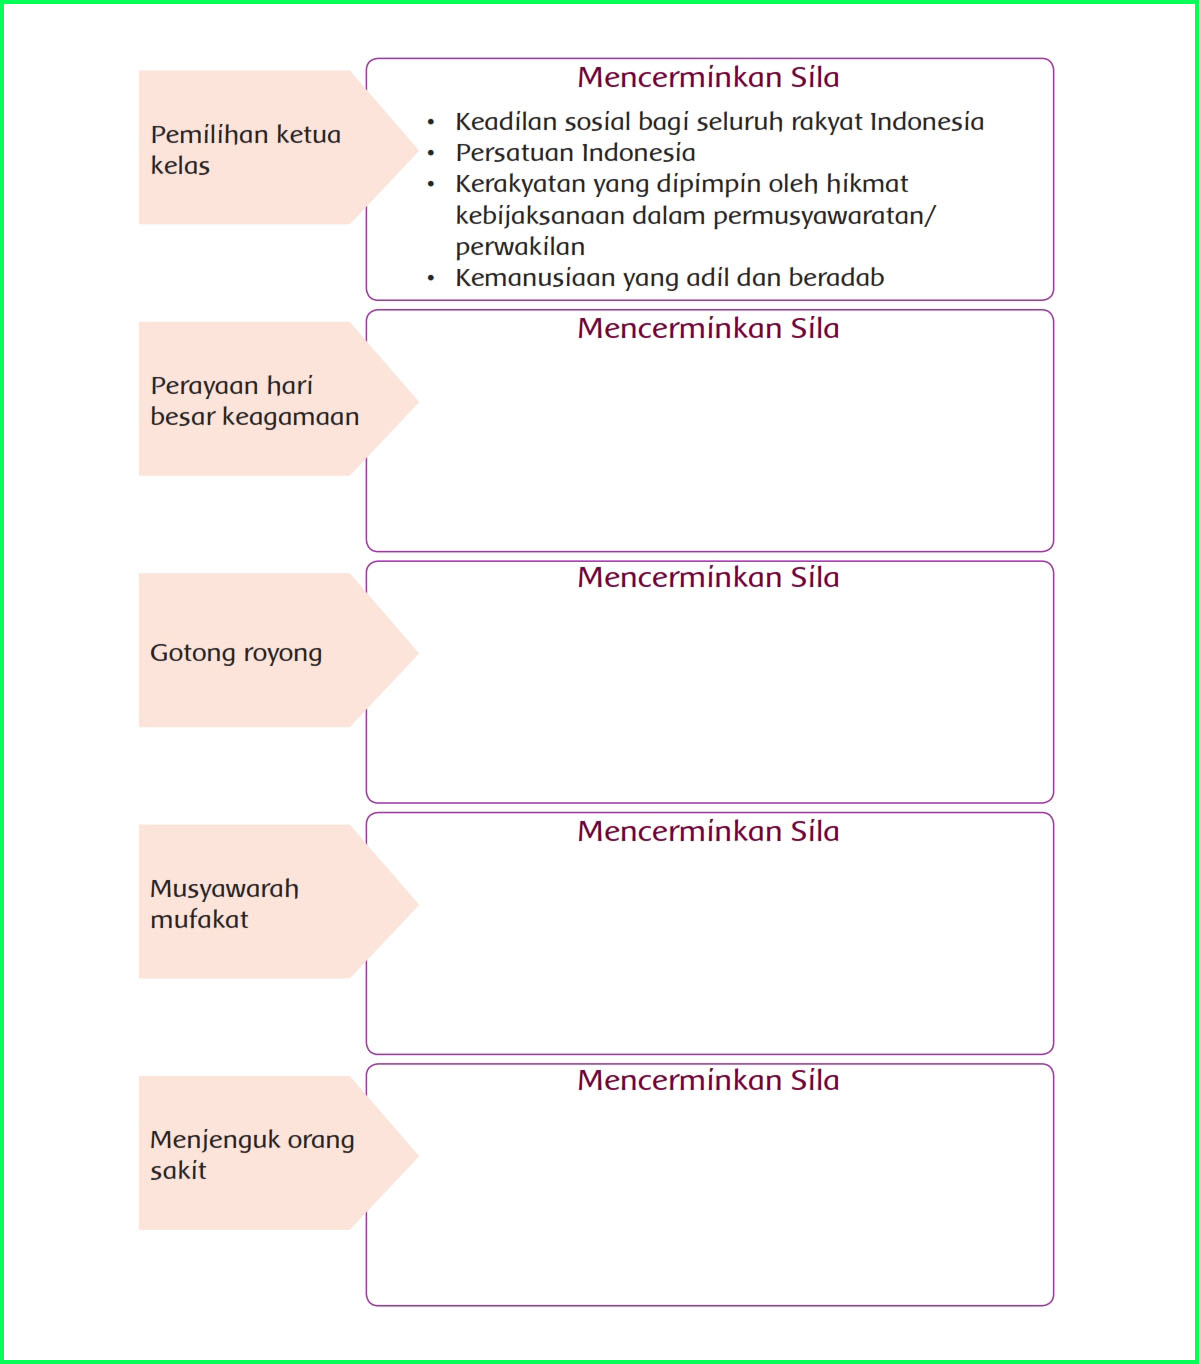 Jawaban Tugas Bahasa Indonesia Kelas 11 Kurikulum 2013 ...